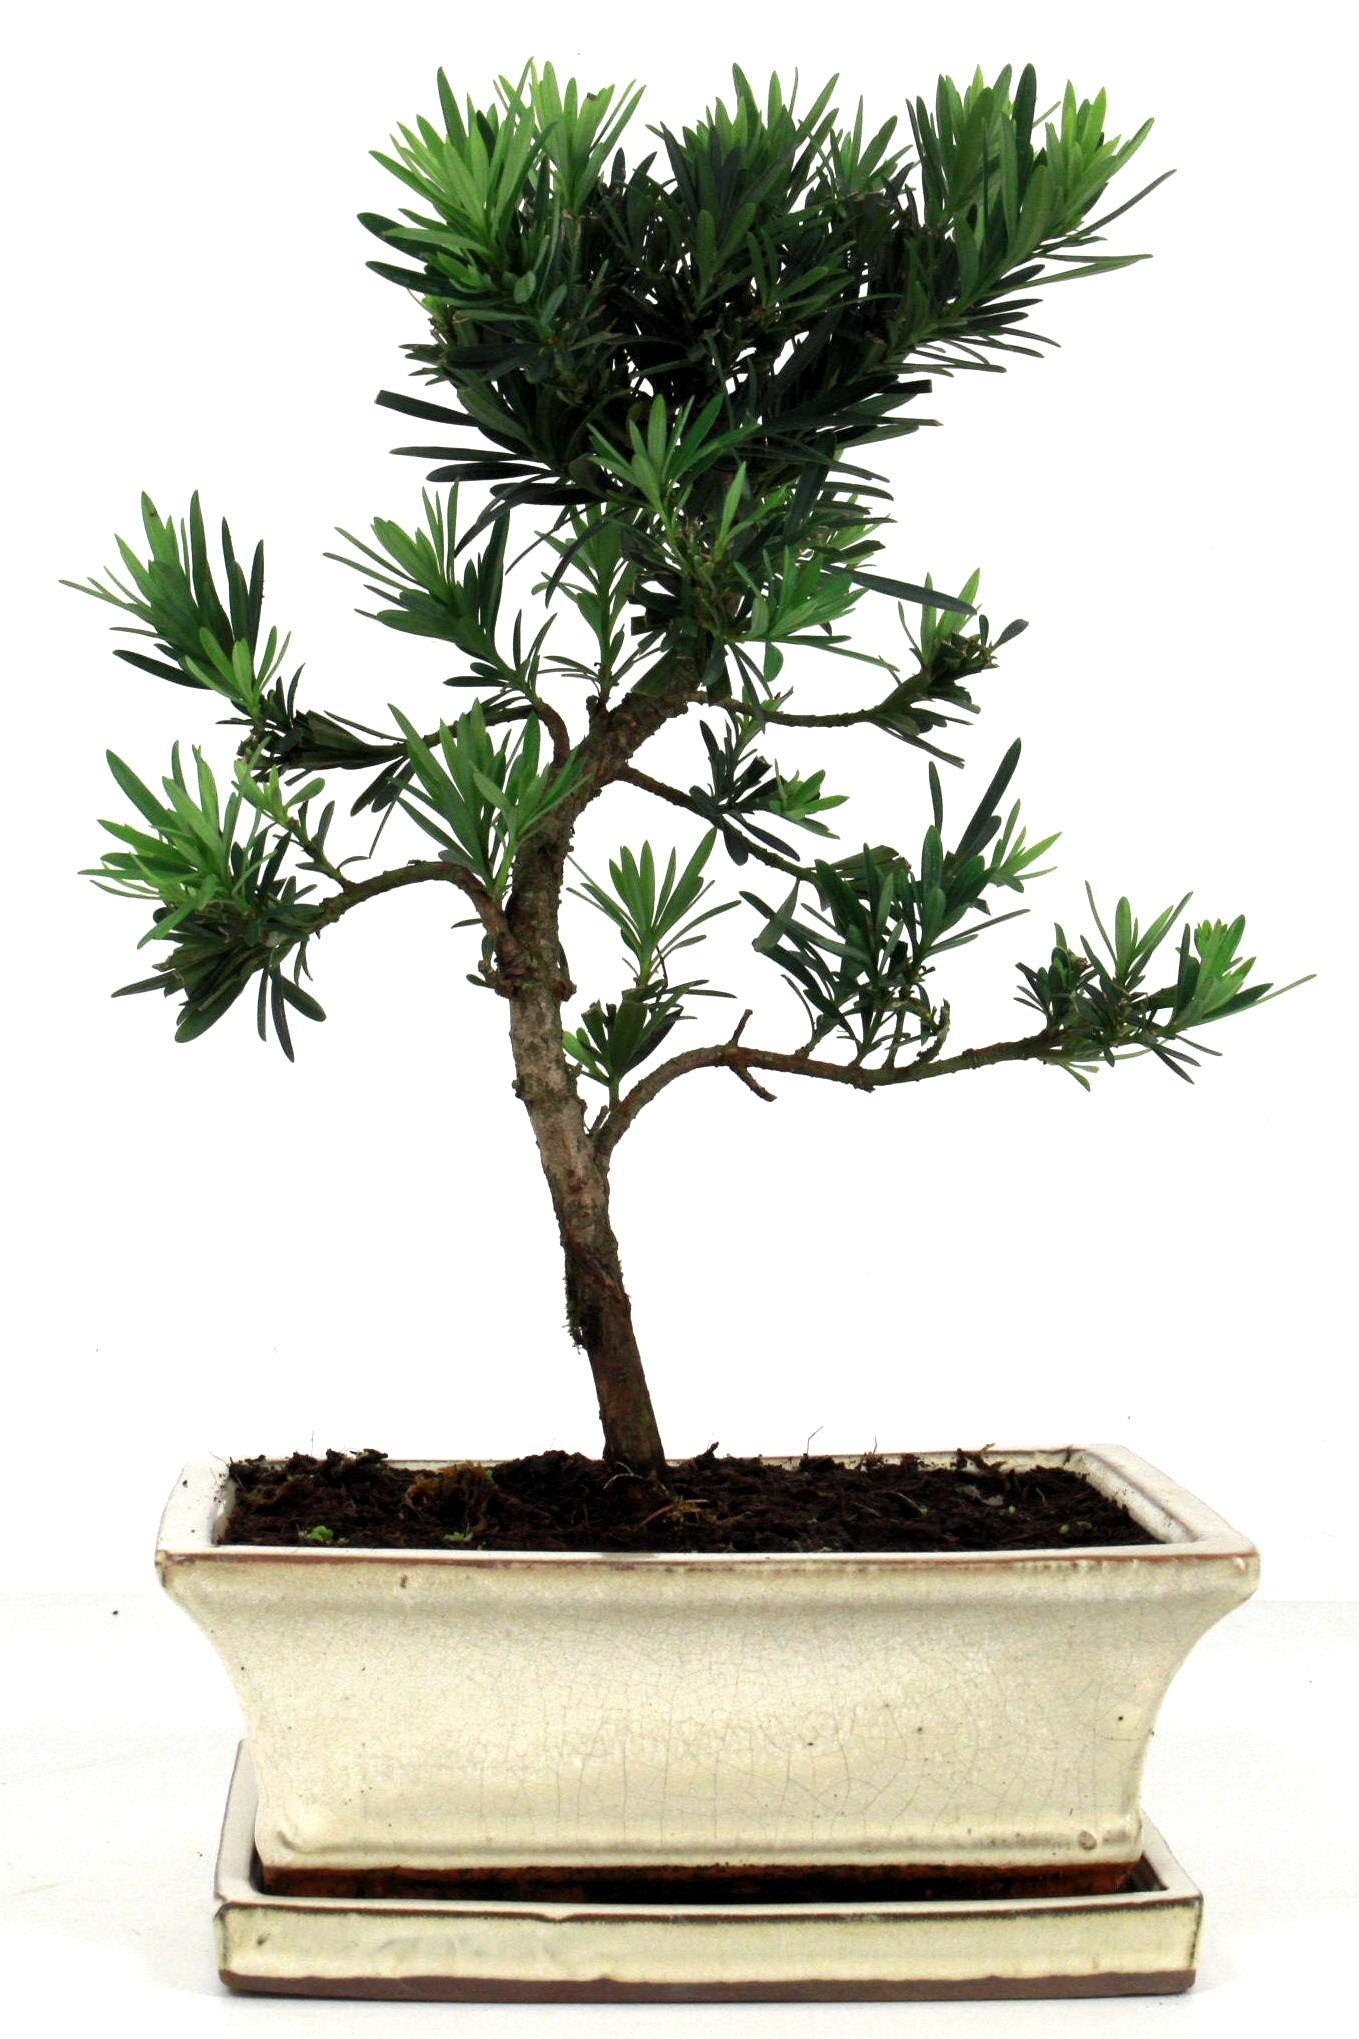 steineibe bonsai 35 40 cm 1930 bei oyaki bonsai kaufen. Black Bedroom Furniture Sets. Home Design Ideas